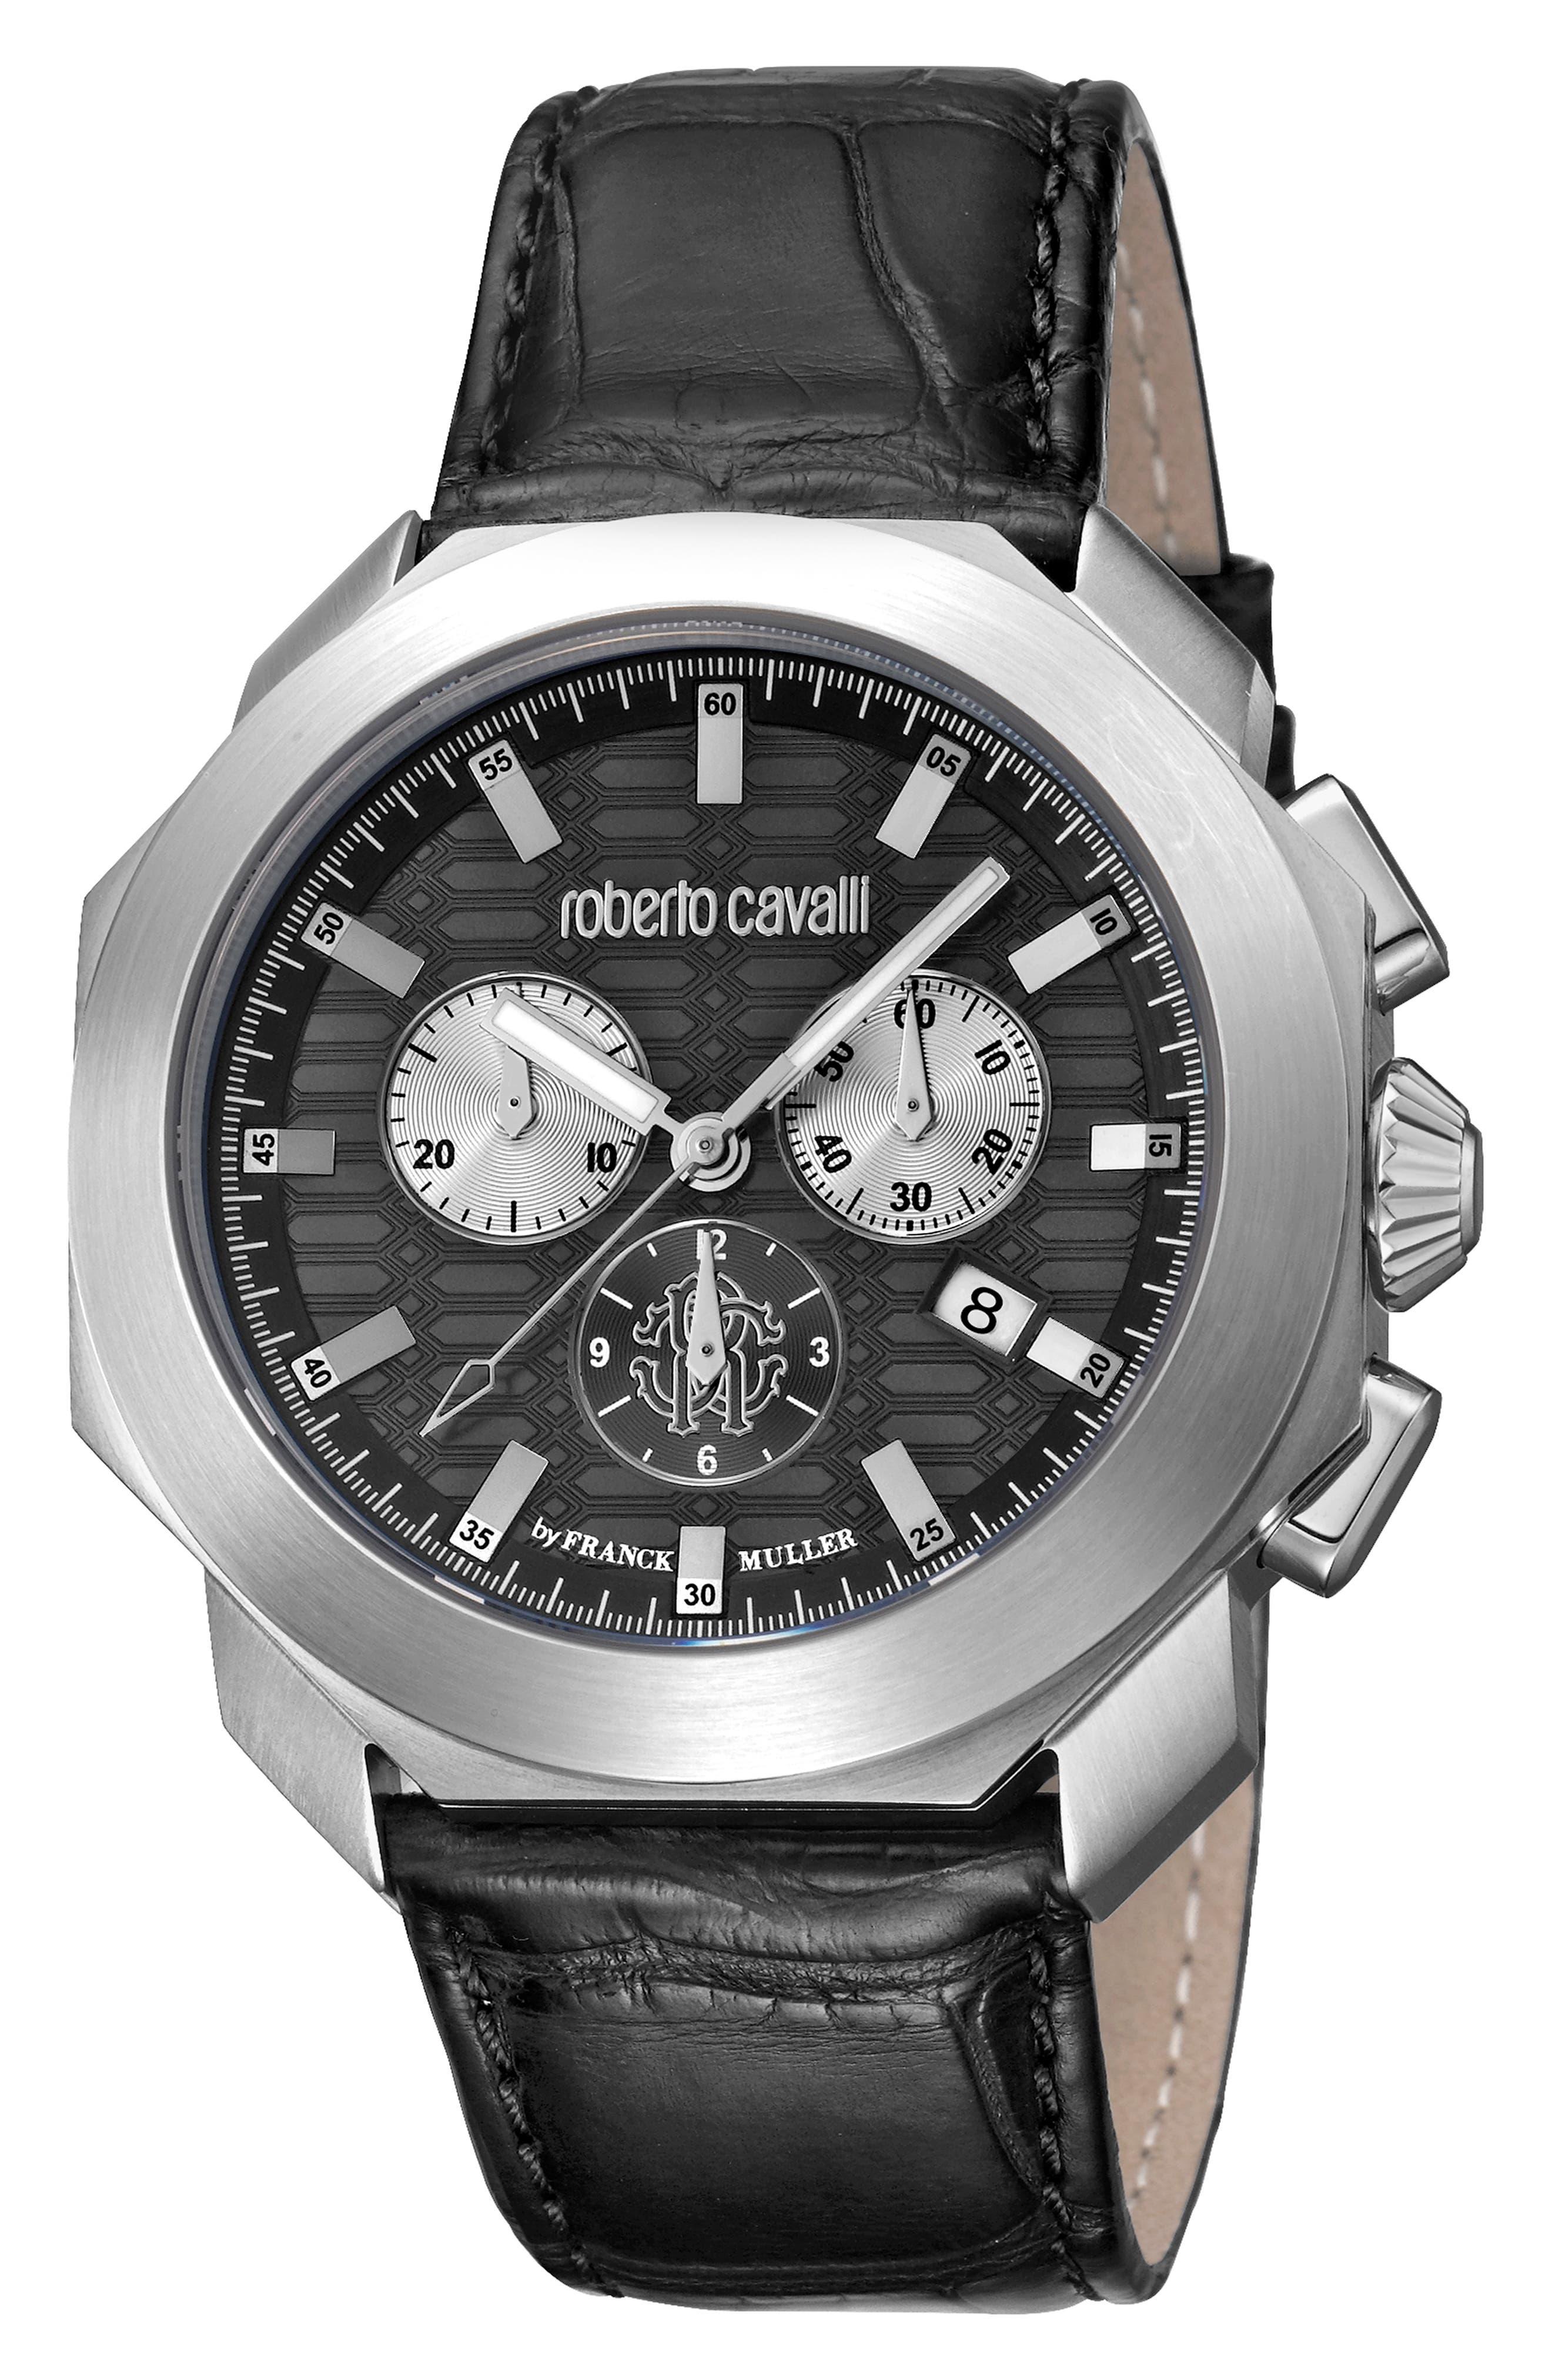 Sport Chronograph Leather Strap Watch,                             Main thumbnail 1, color,                             Black/ Silver/ Black